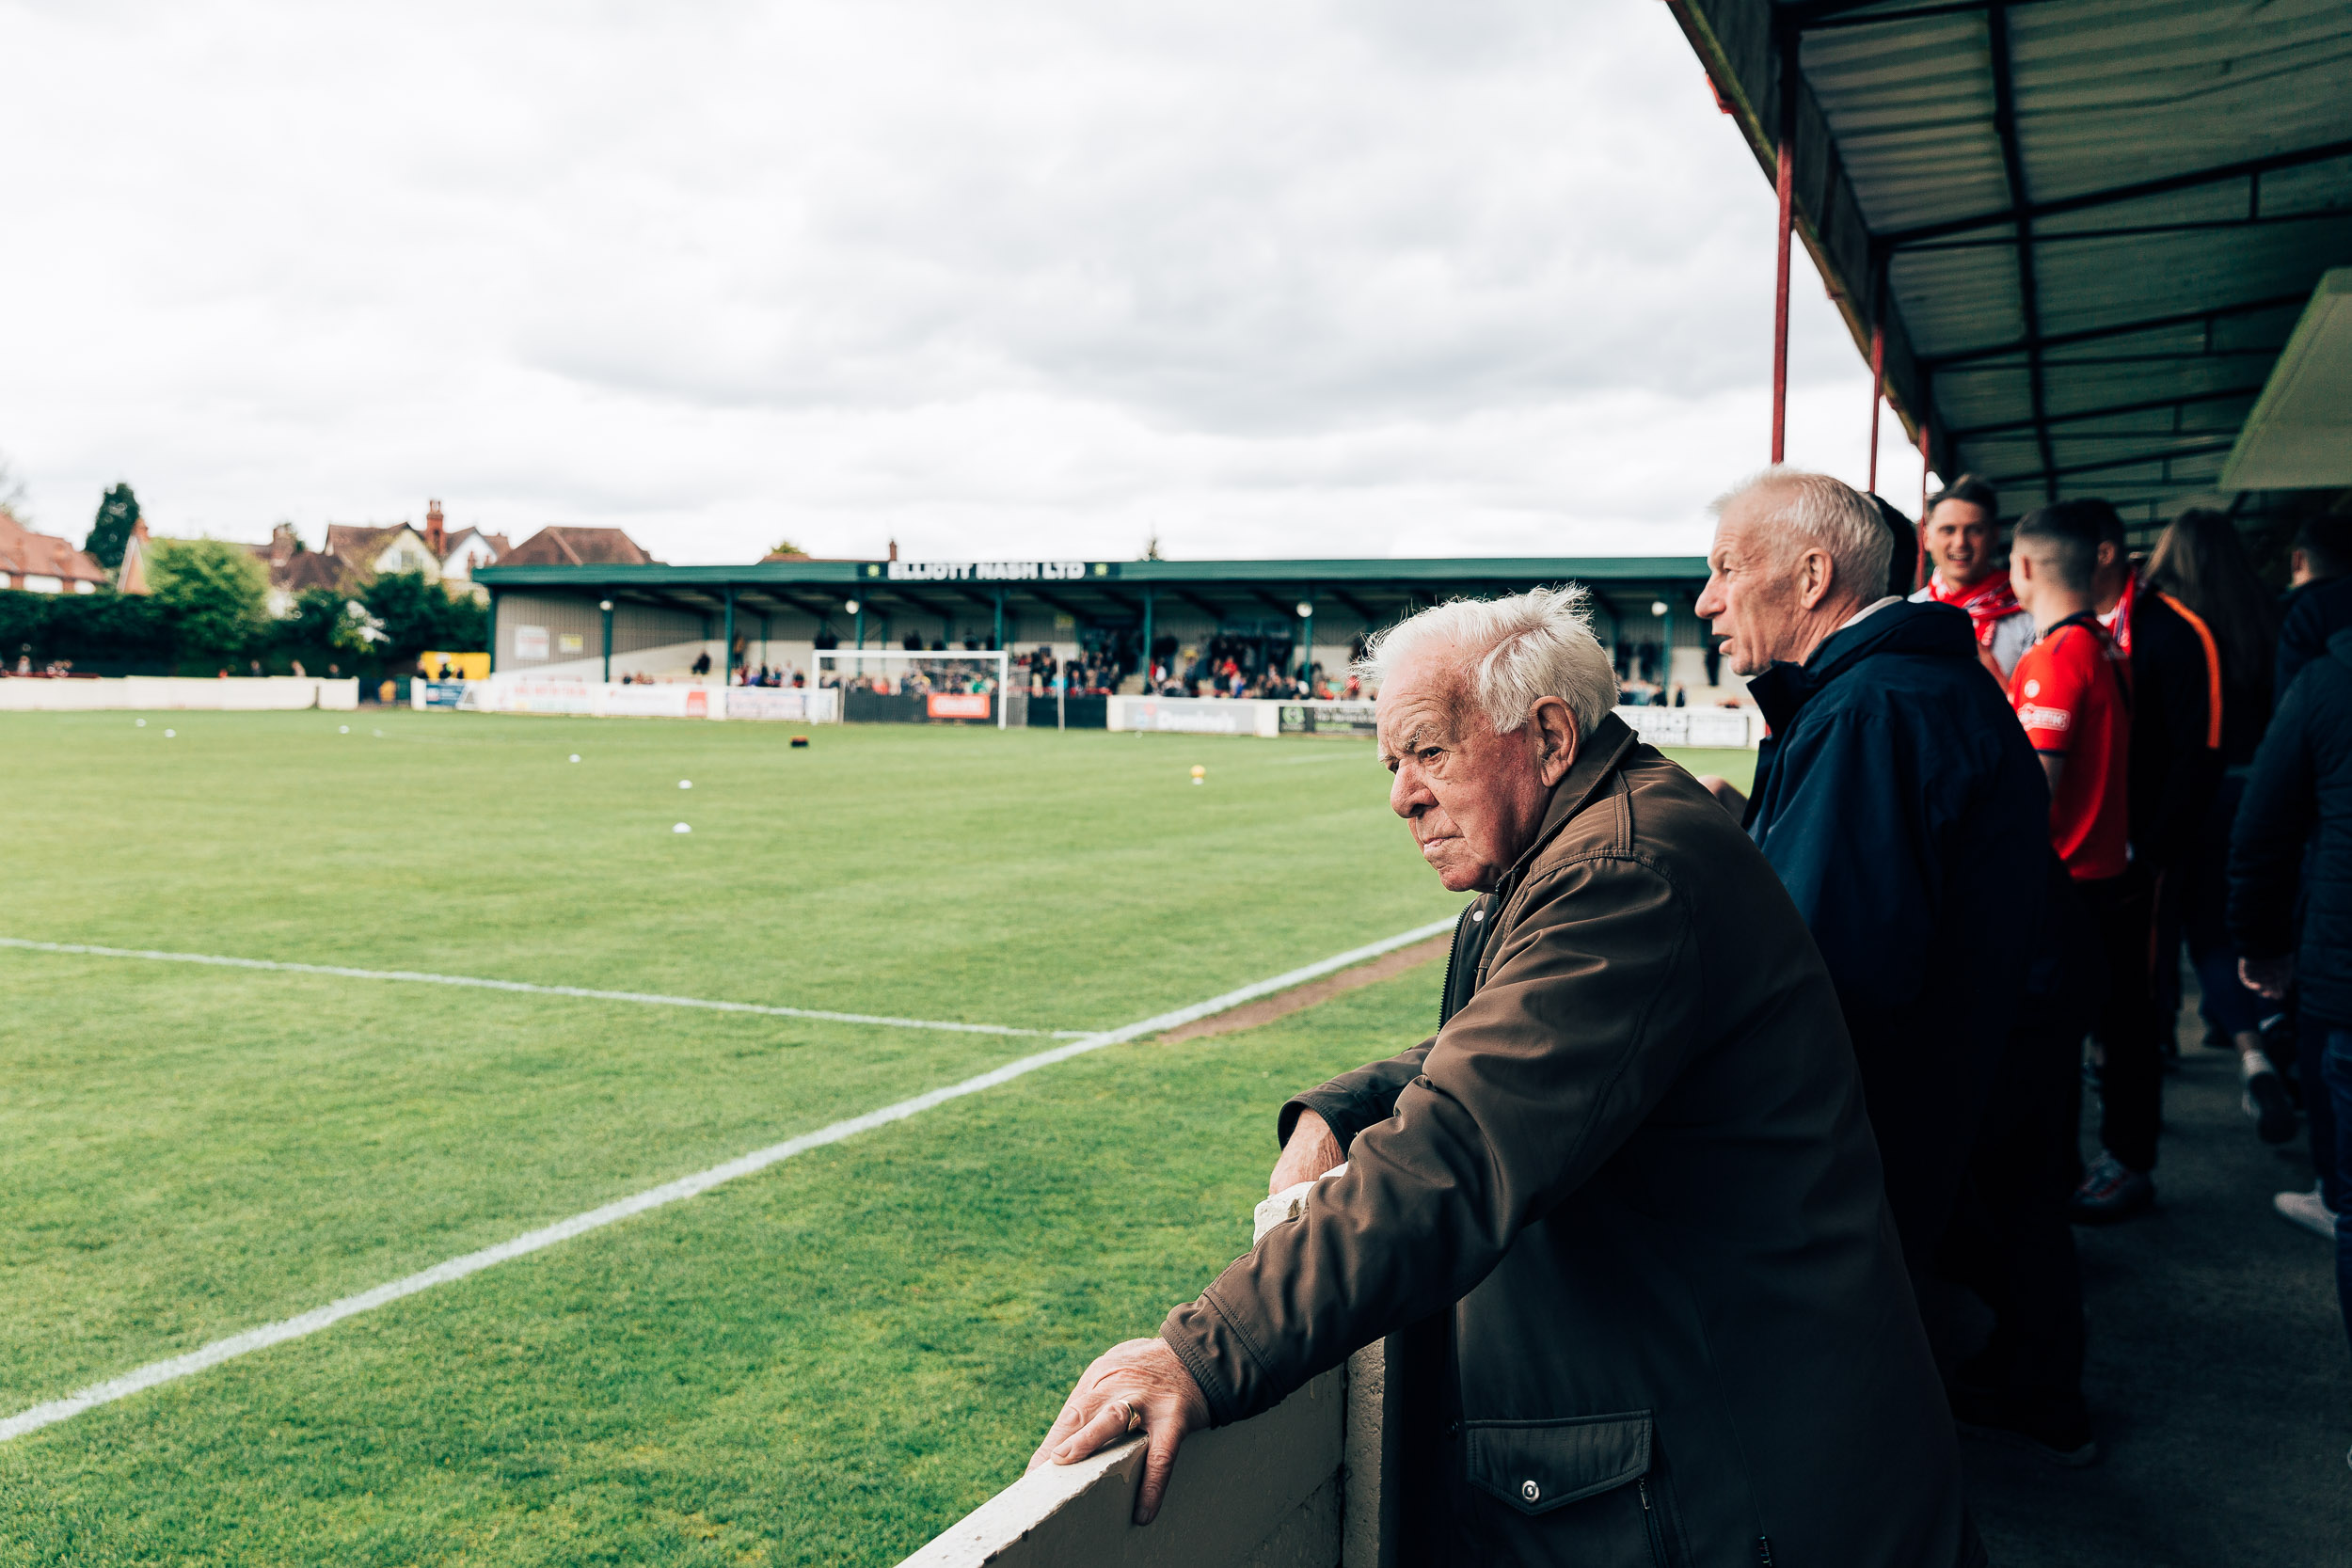 06_05_2019_Bromsgrove_Sporting_Corby-15.jpg